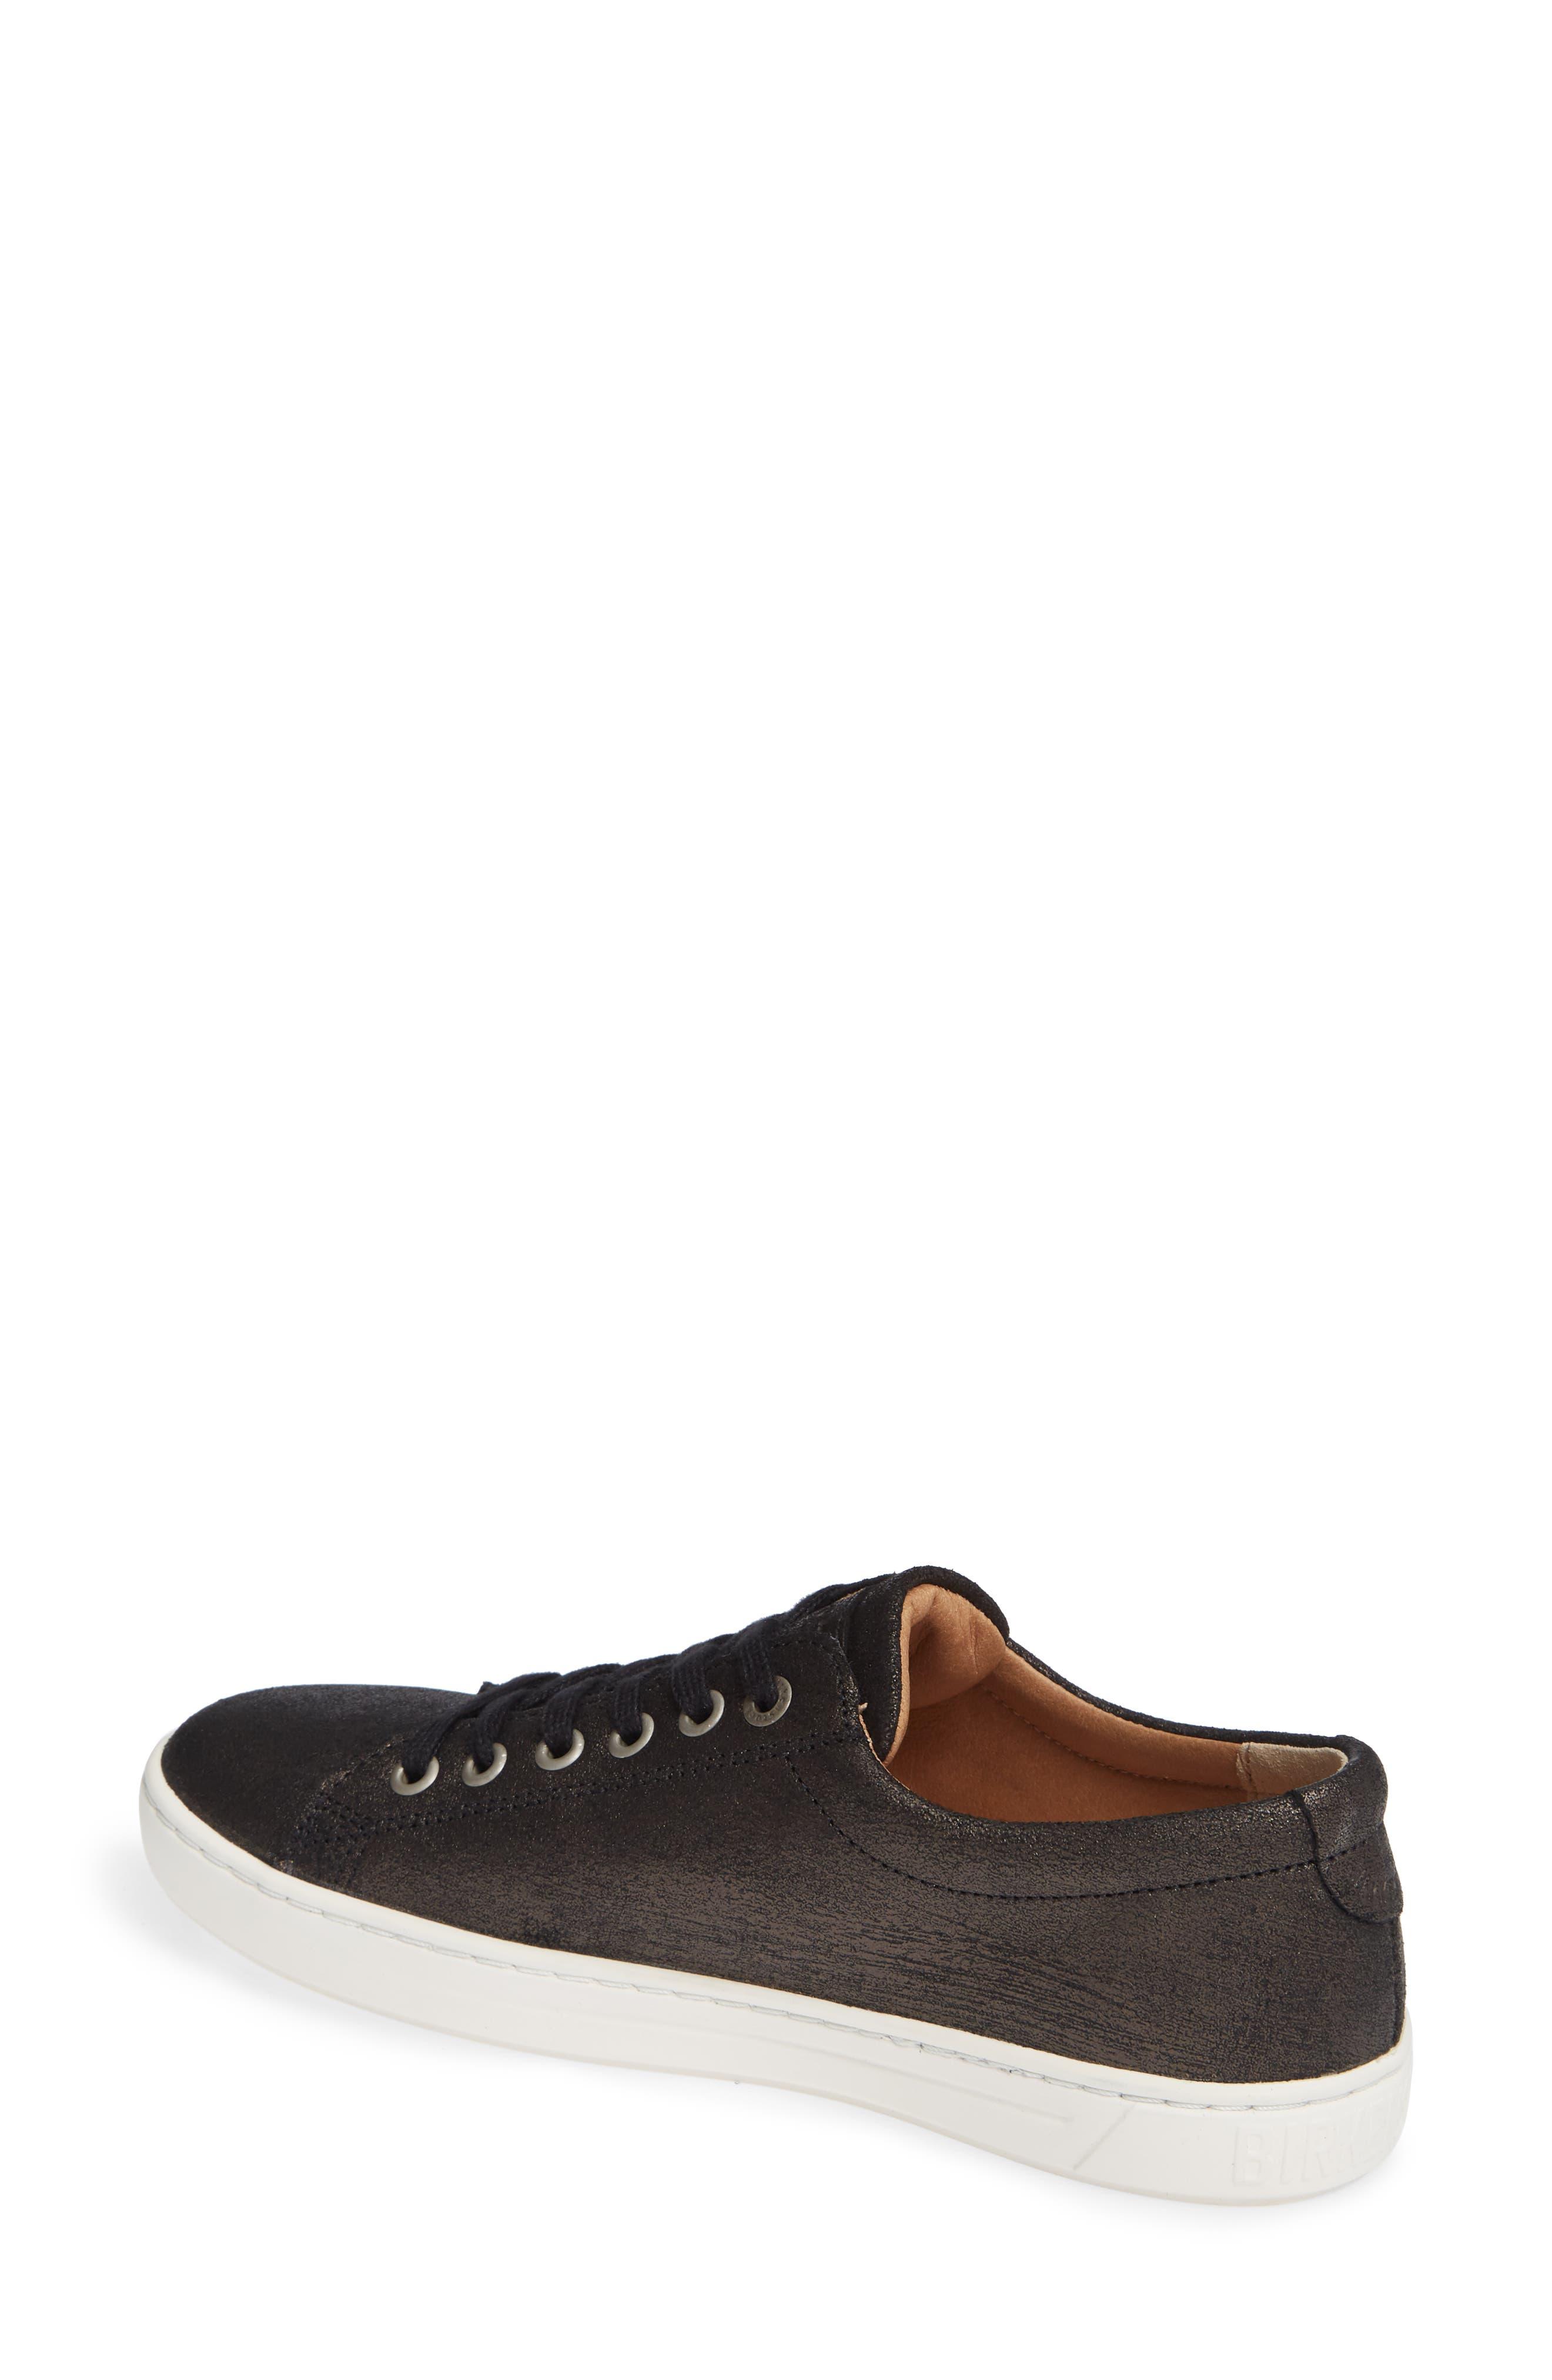 Arran Sneaker,                             Alternate thumbnail 2, color,                             METALLIC BLACK